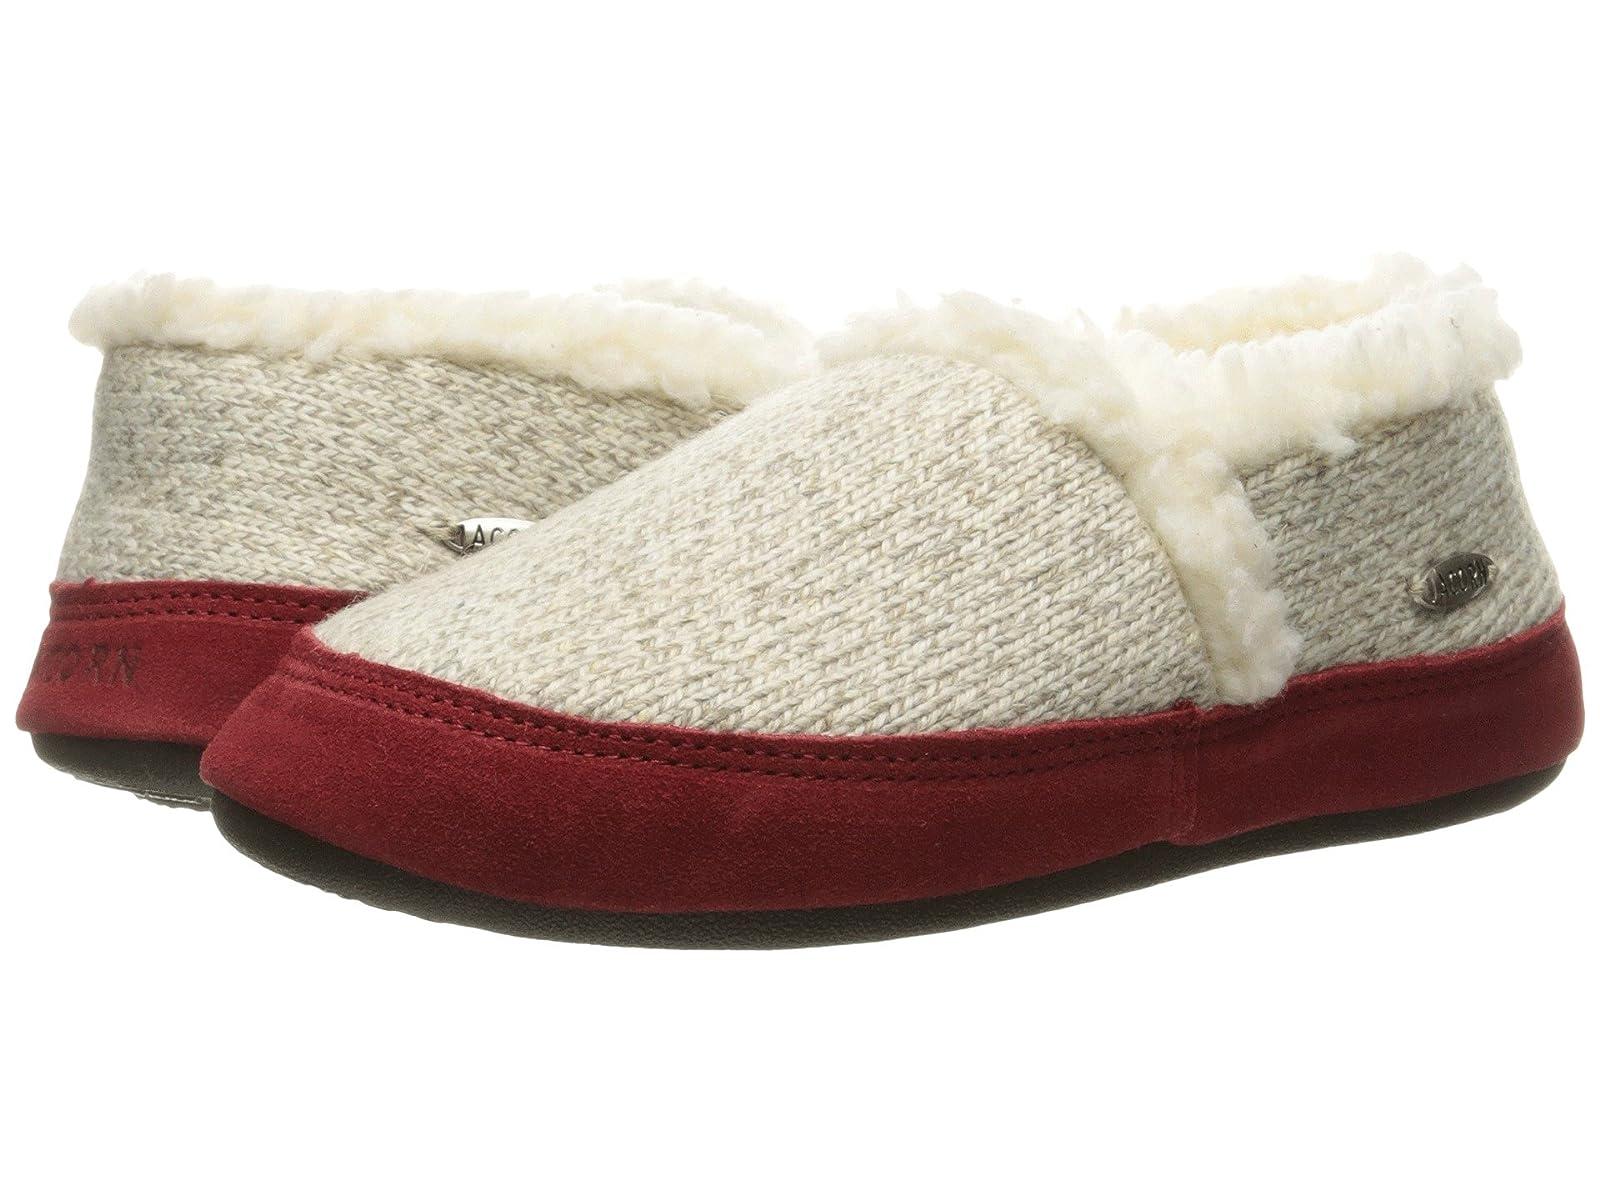 Acorn Moc RaggAtmospheric grades have affordable shoes